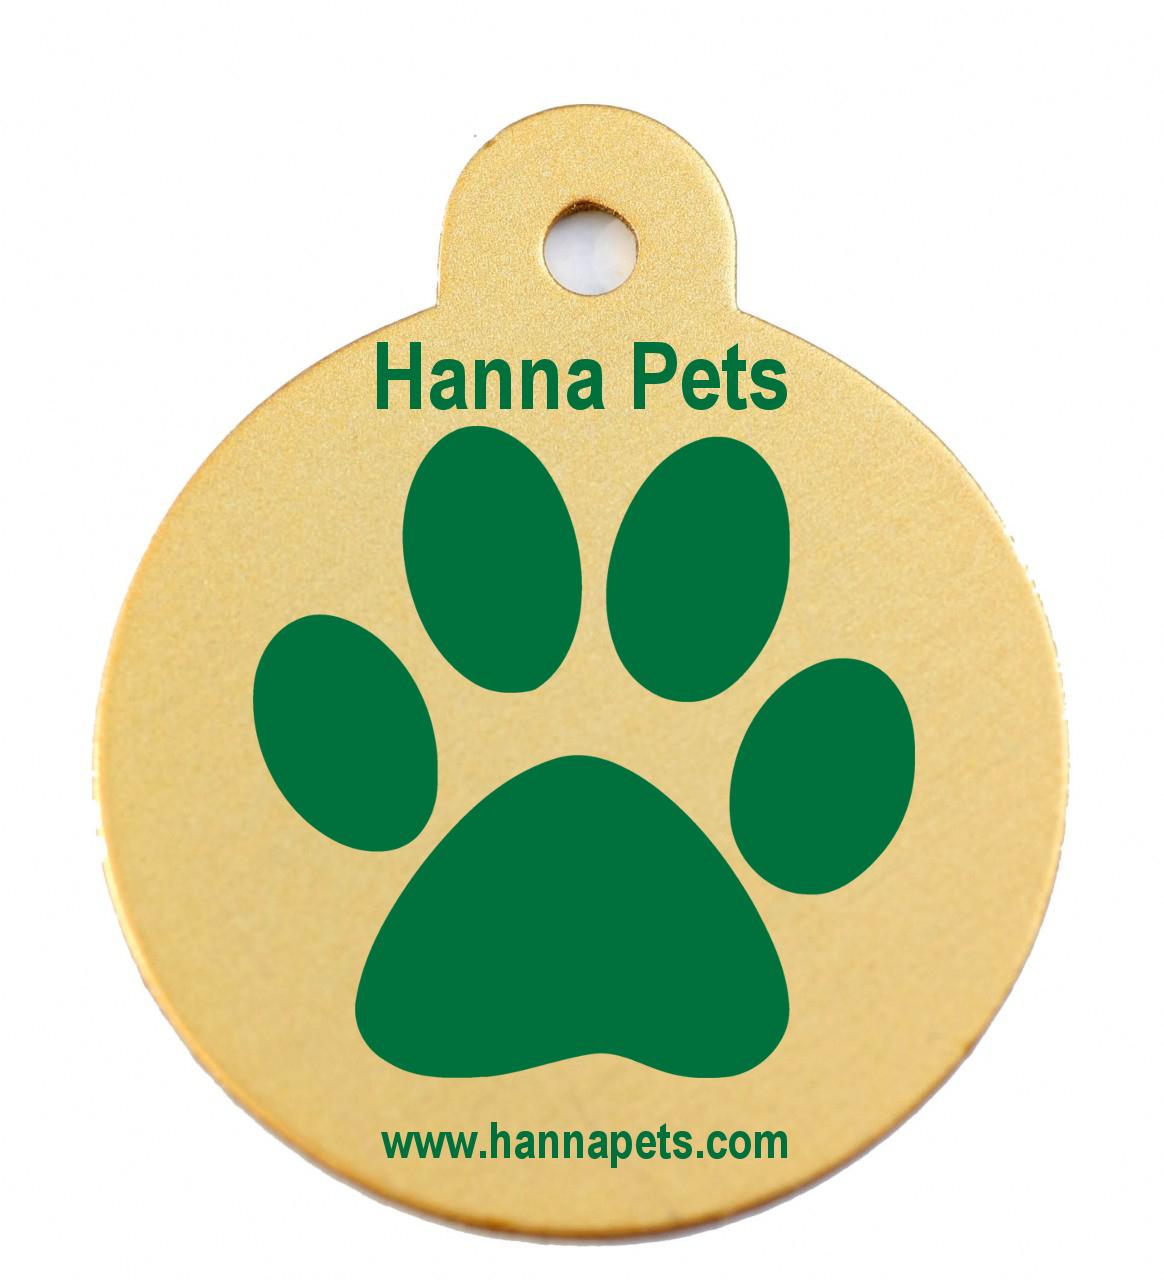 Hanna Pets